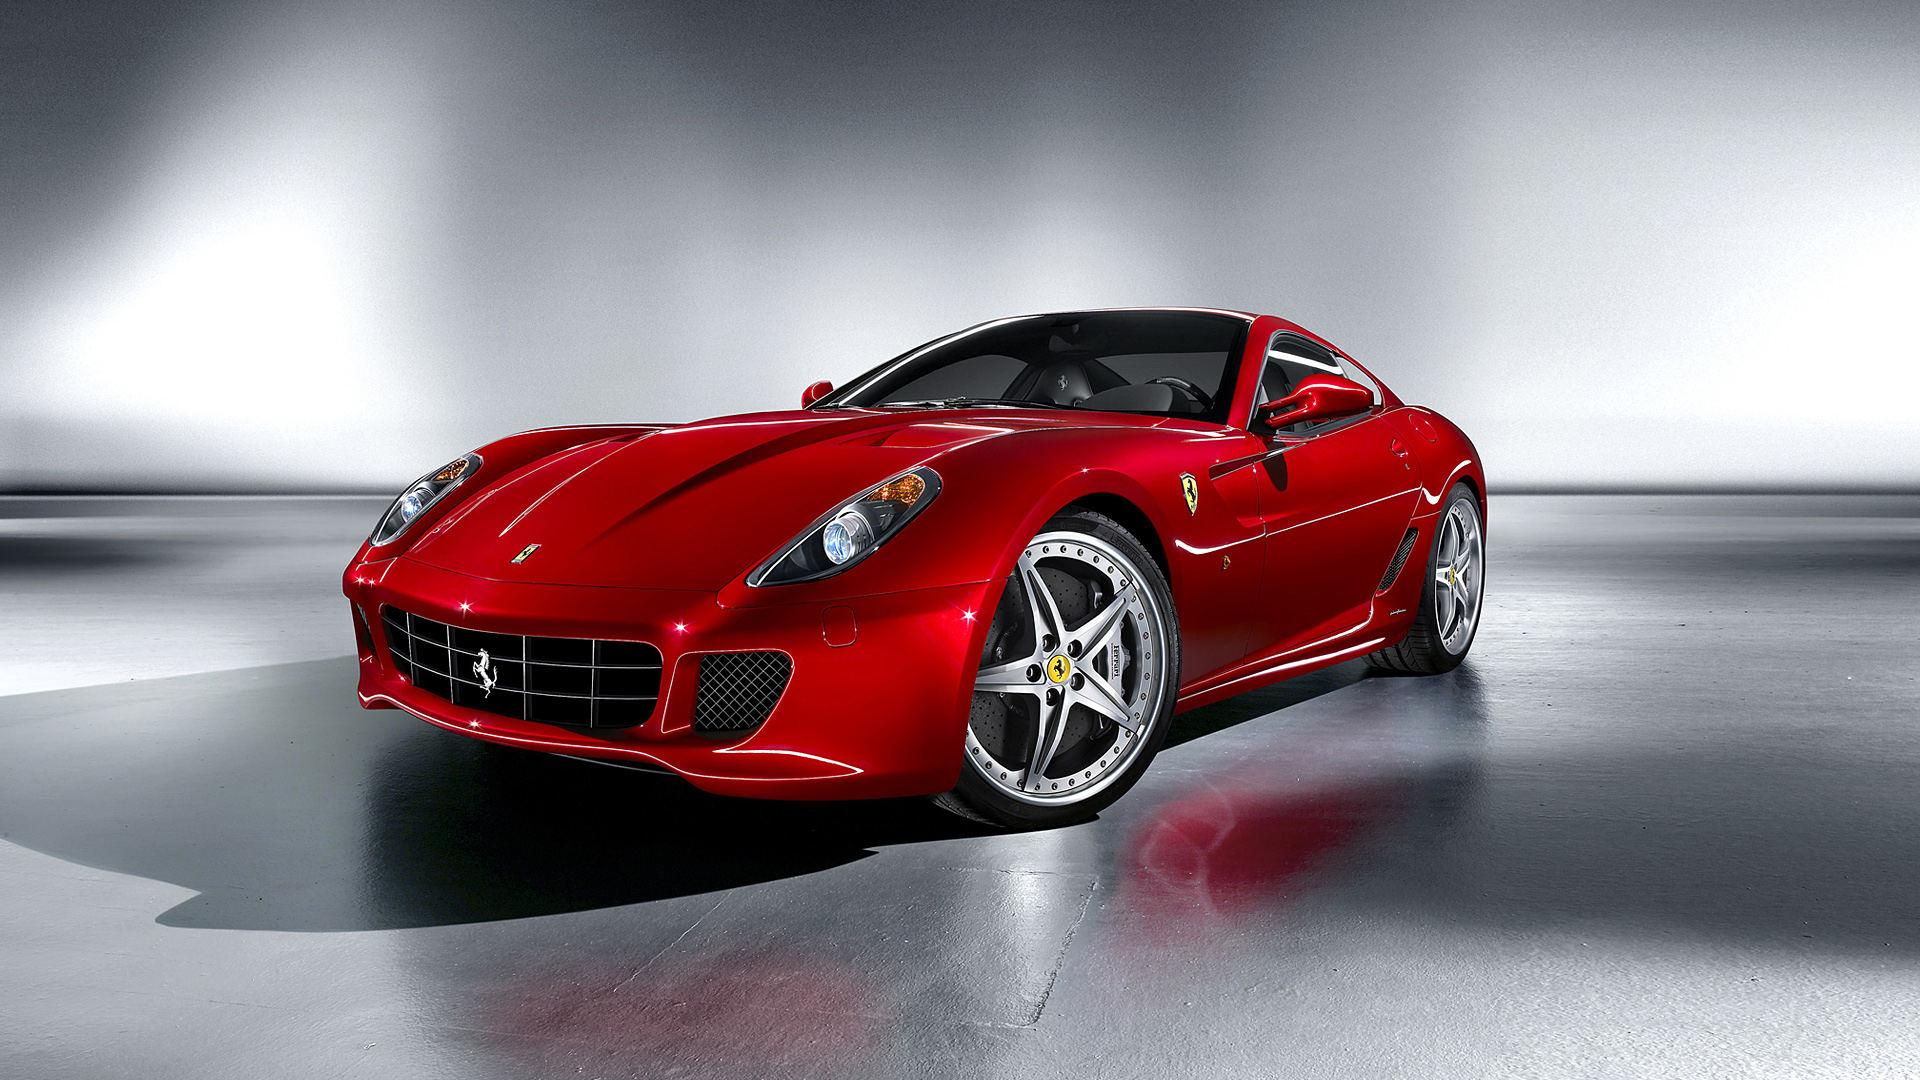 2009 Ferrari 599 Handling GTE Package